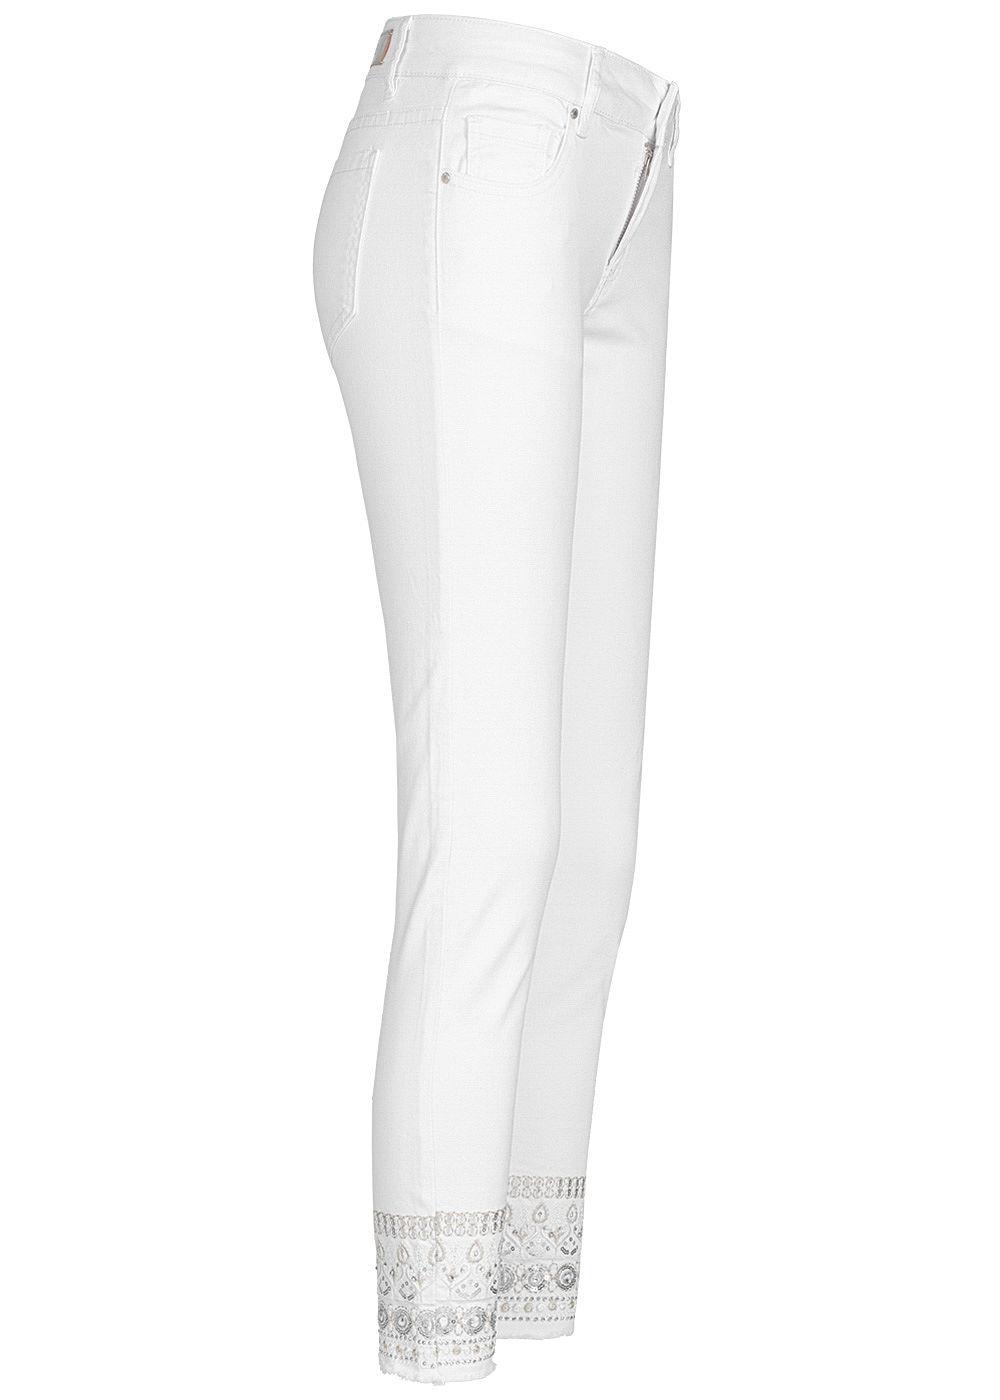 Hailys Damen Ankle Jeans Hose Mid Waist 5 Pockets Fransen Pailletten weiss